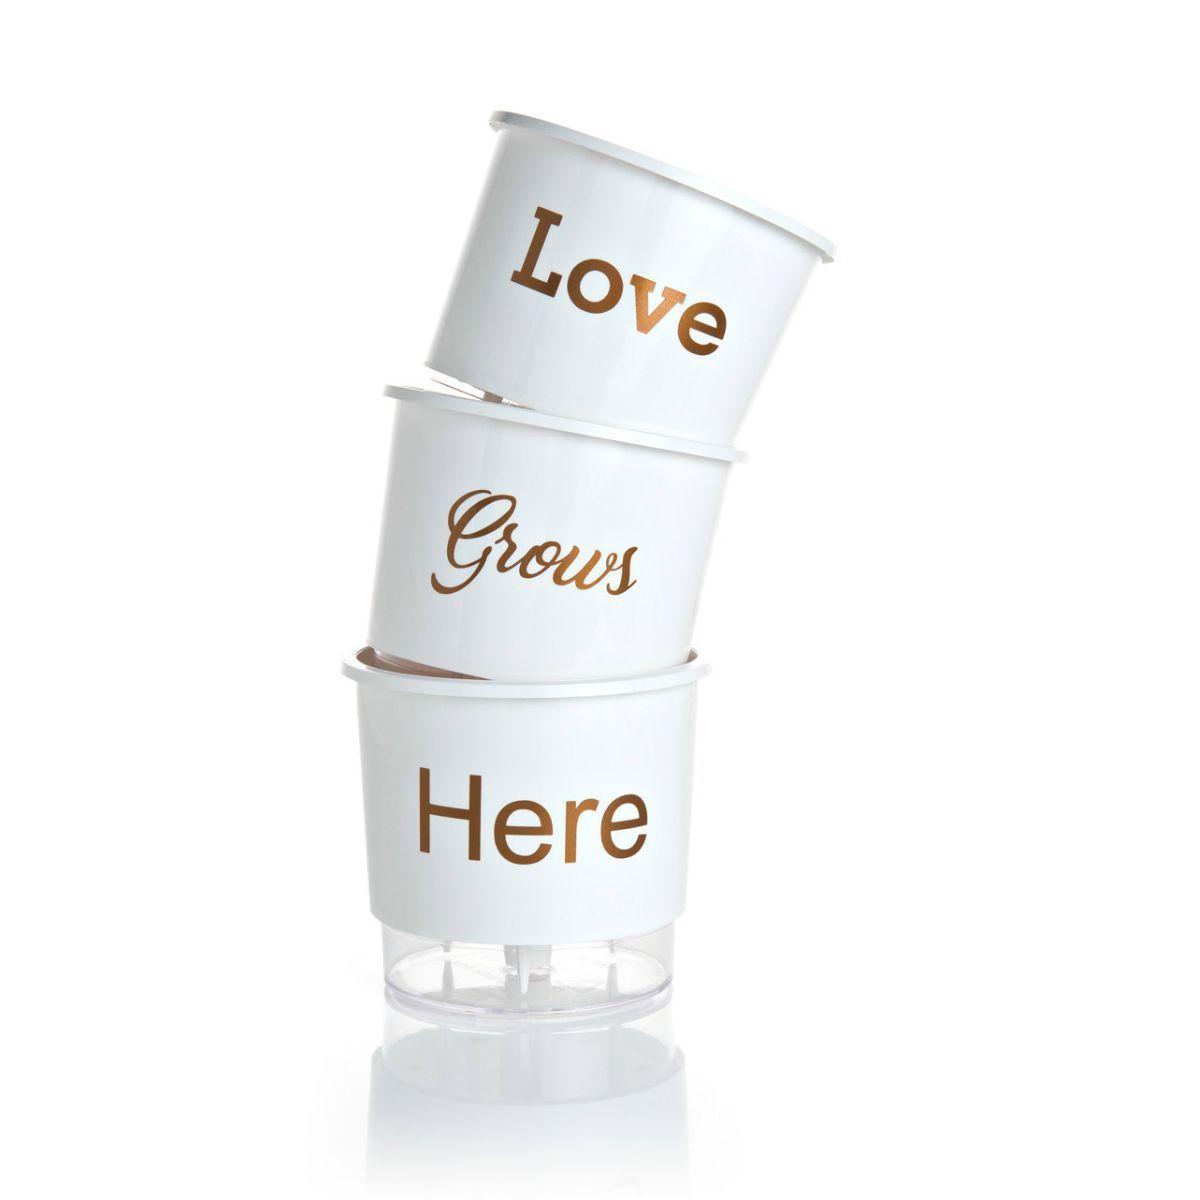 Kit 3 Vasos Autoirrigáveis Pequenos N02 12 cm x 11 cm Love Grows Here Branco